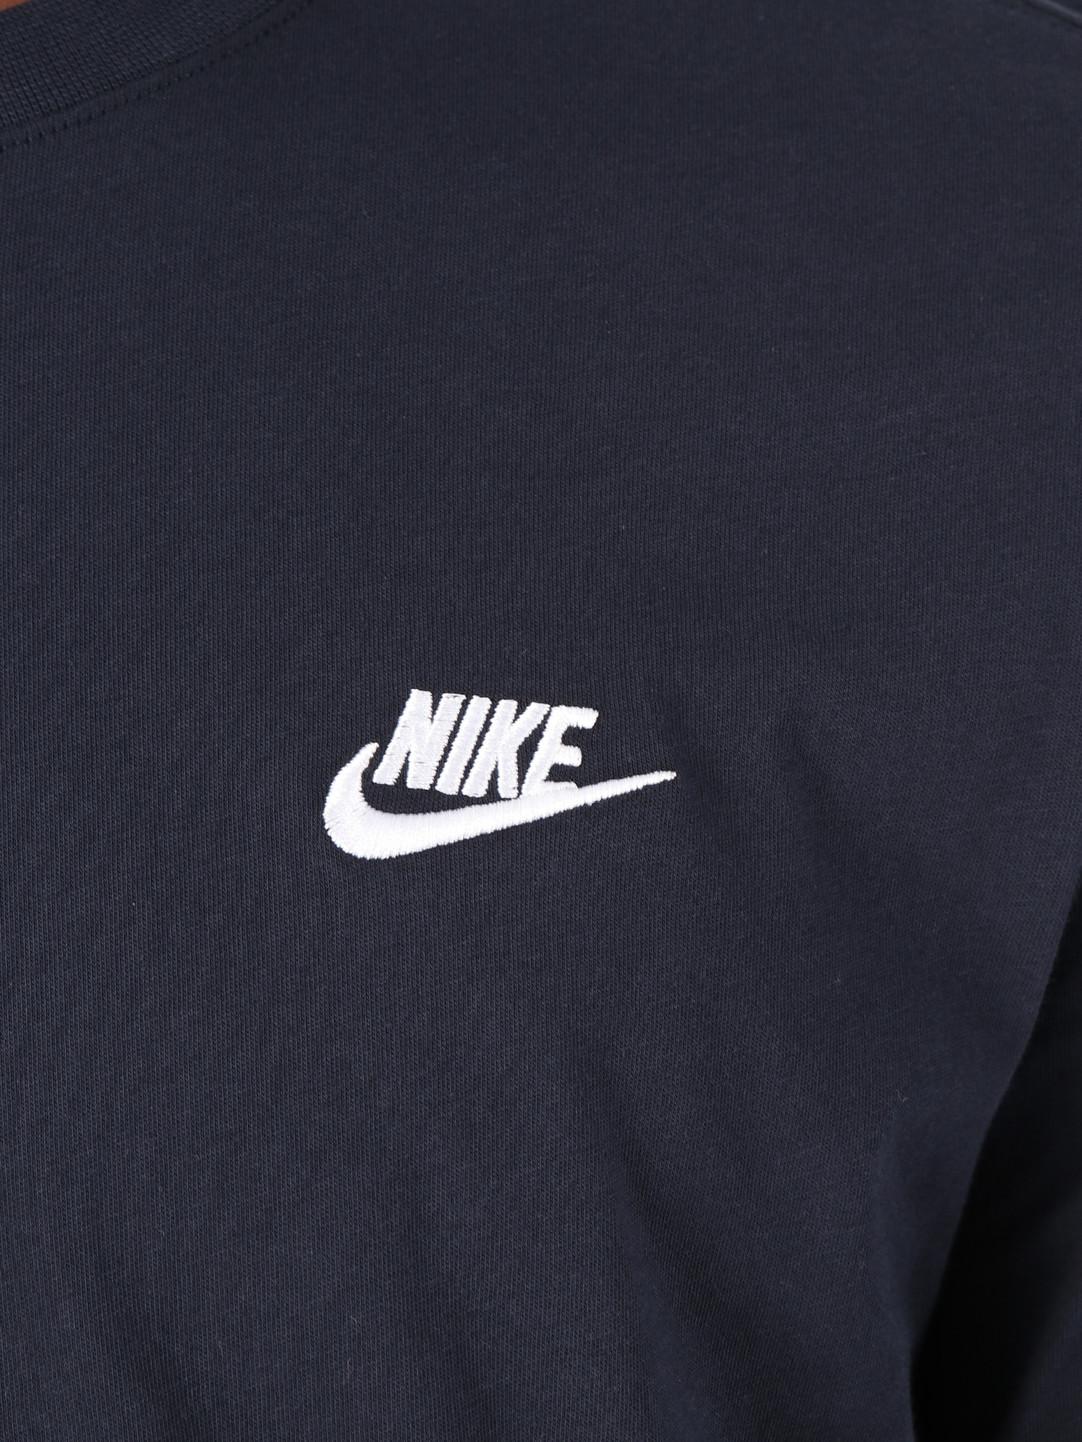 Nike Nike Sportswear T-Shirt Dark Obsidian White AR4997-475